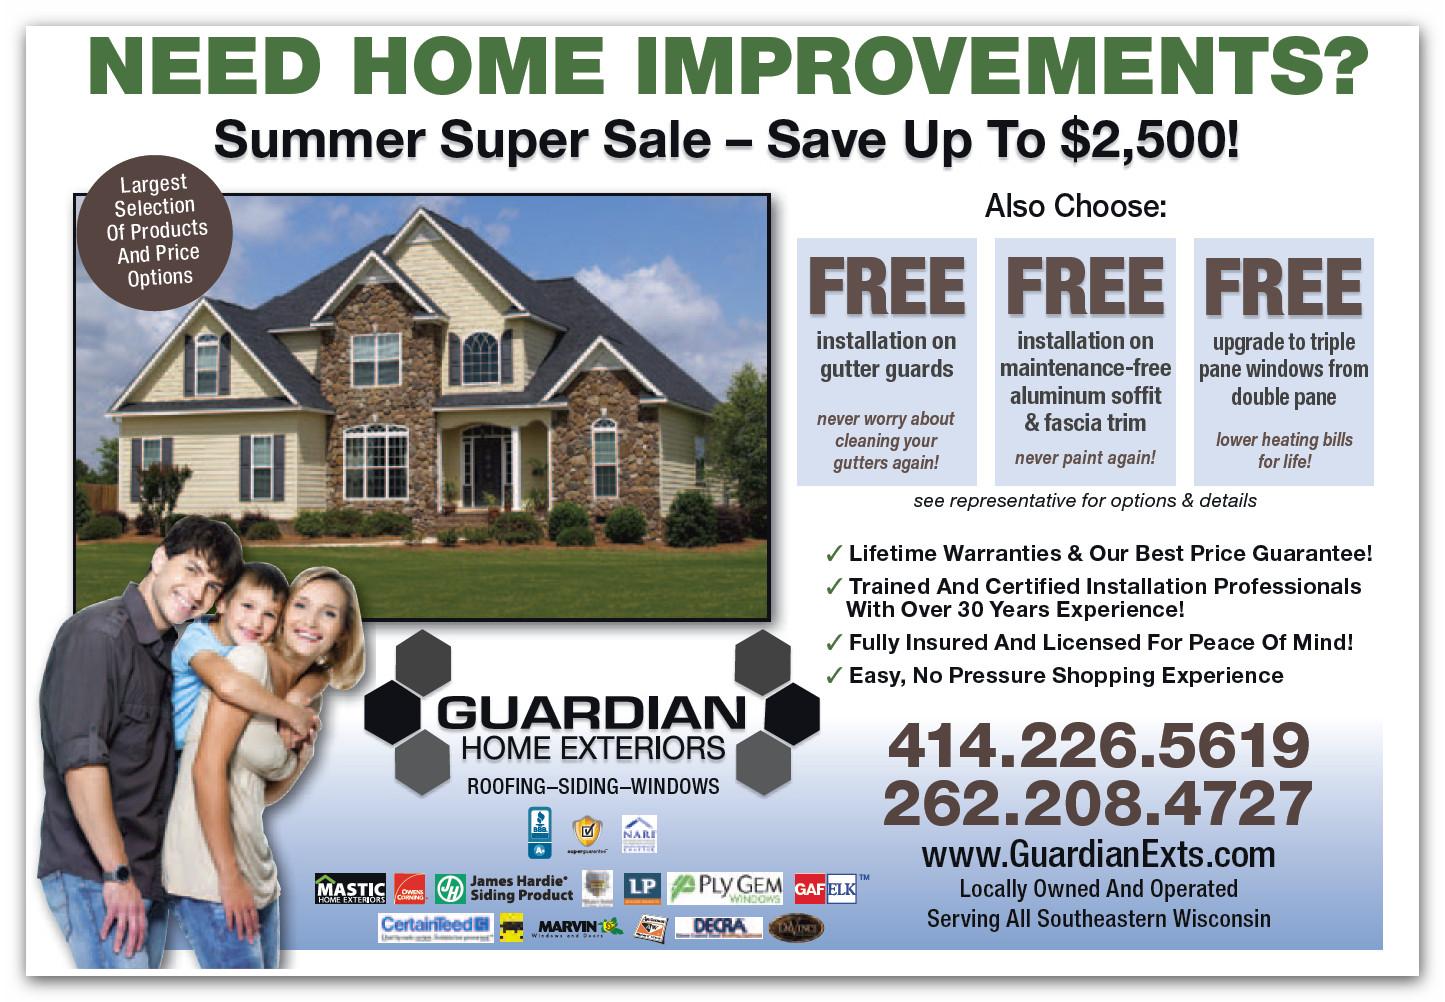 Milwaukee Area Home Improvement Contractor Guardian Inc